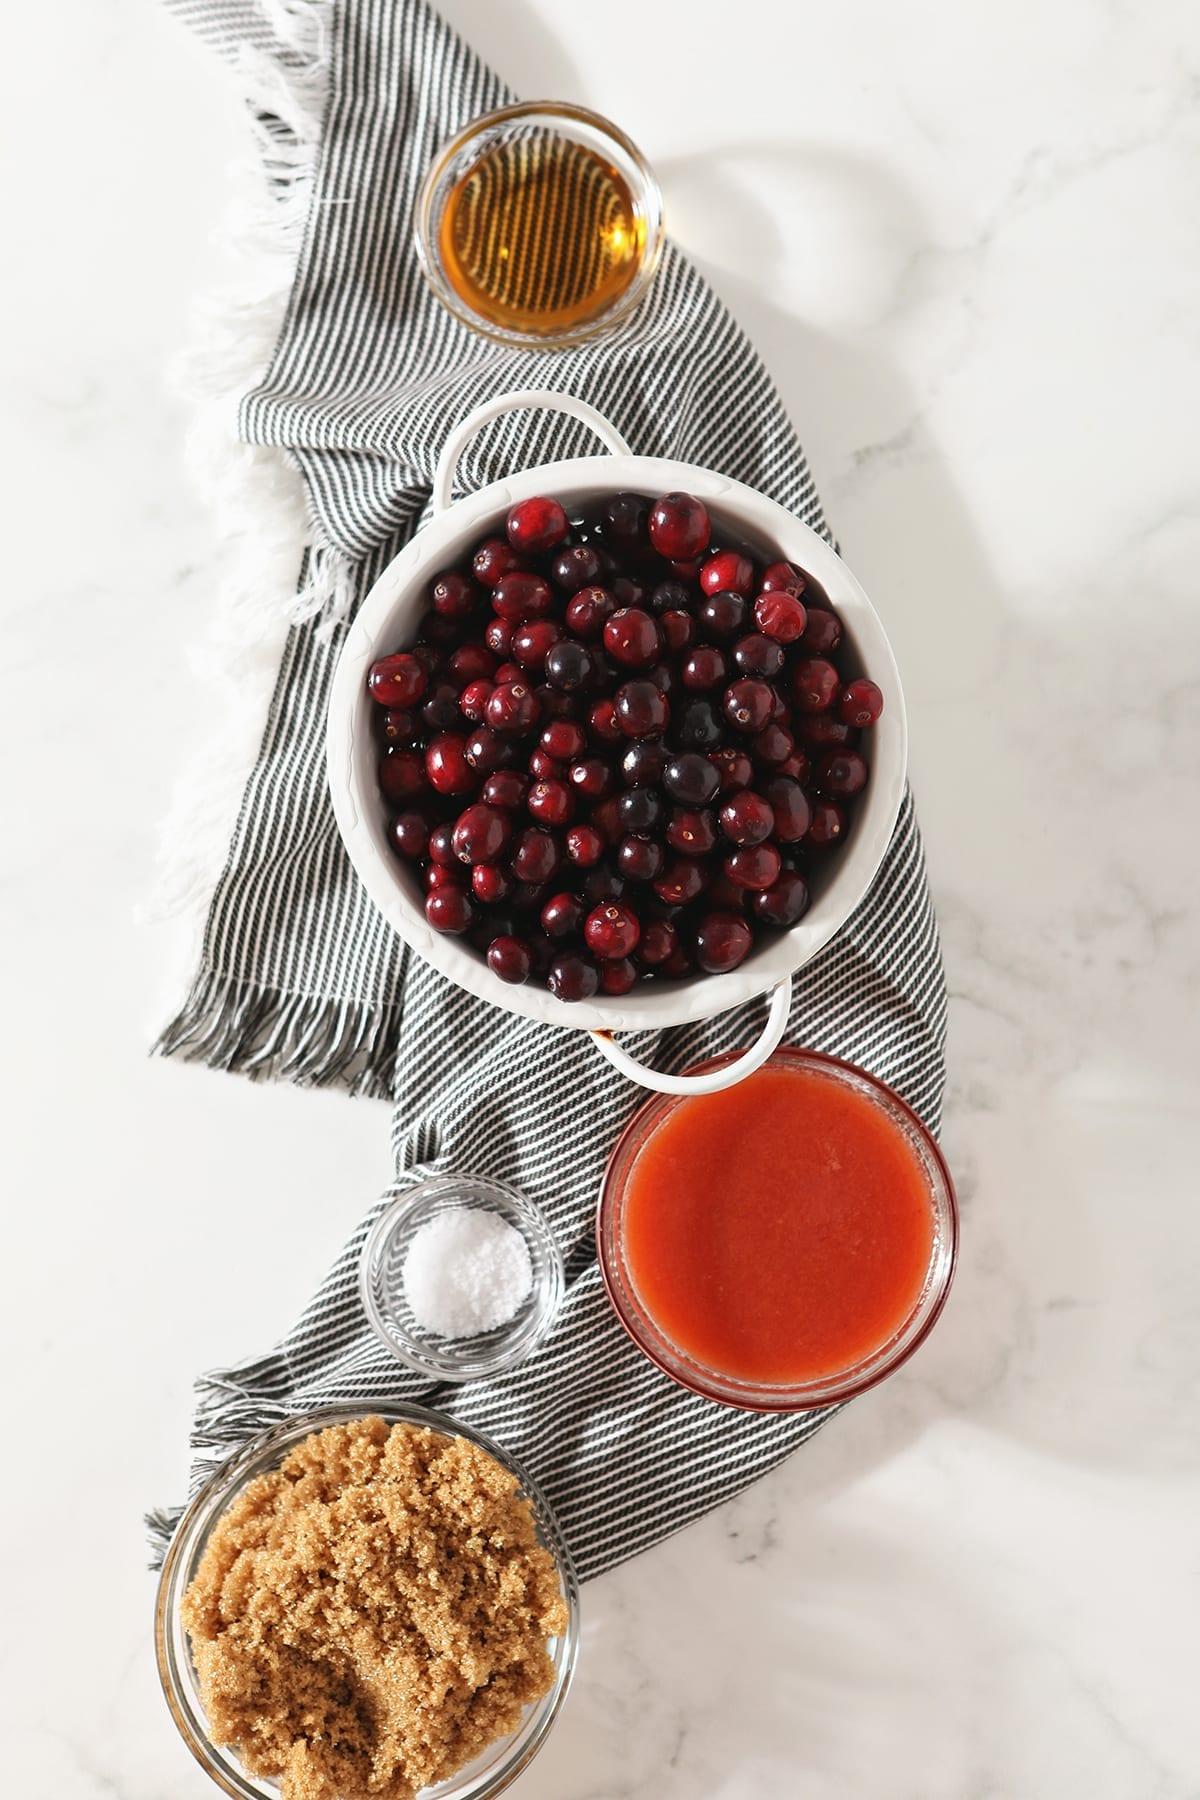 Fresh cranberries, orange juice, brown sugar, salt, and rum on a gray striped towel